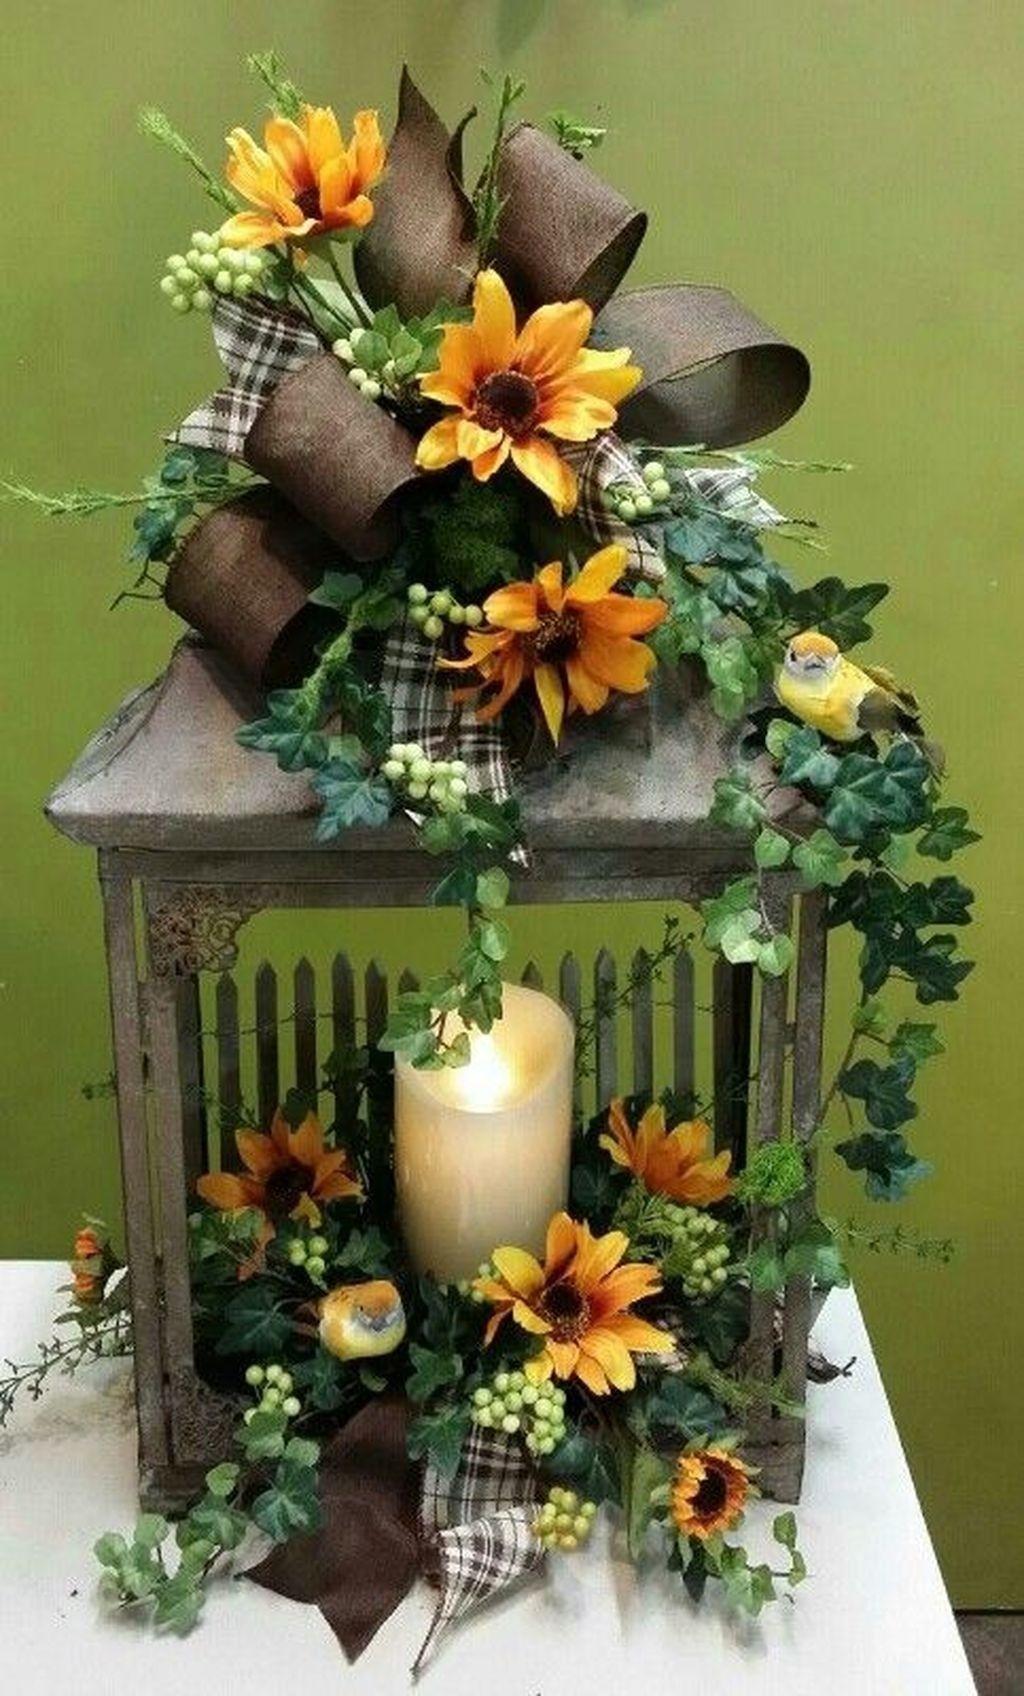 Glass Lantern with Summer Floral Centerpiece Country Fall Lantern Floral Arrangement Farmhouse Sunflower Lantern Swag